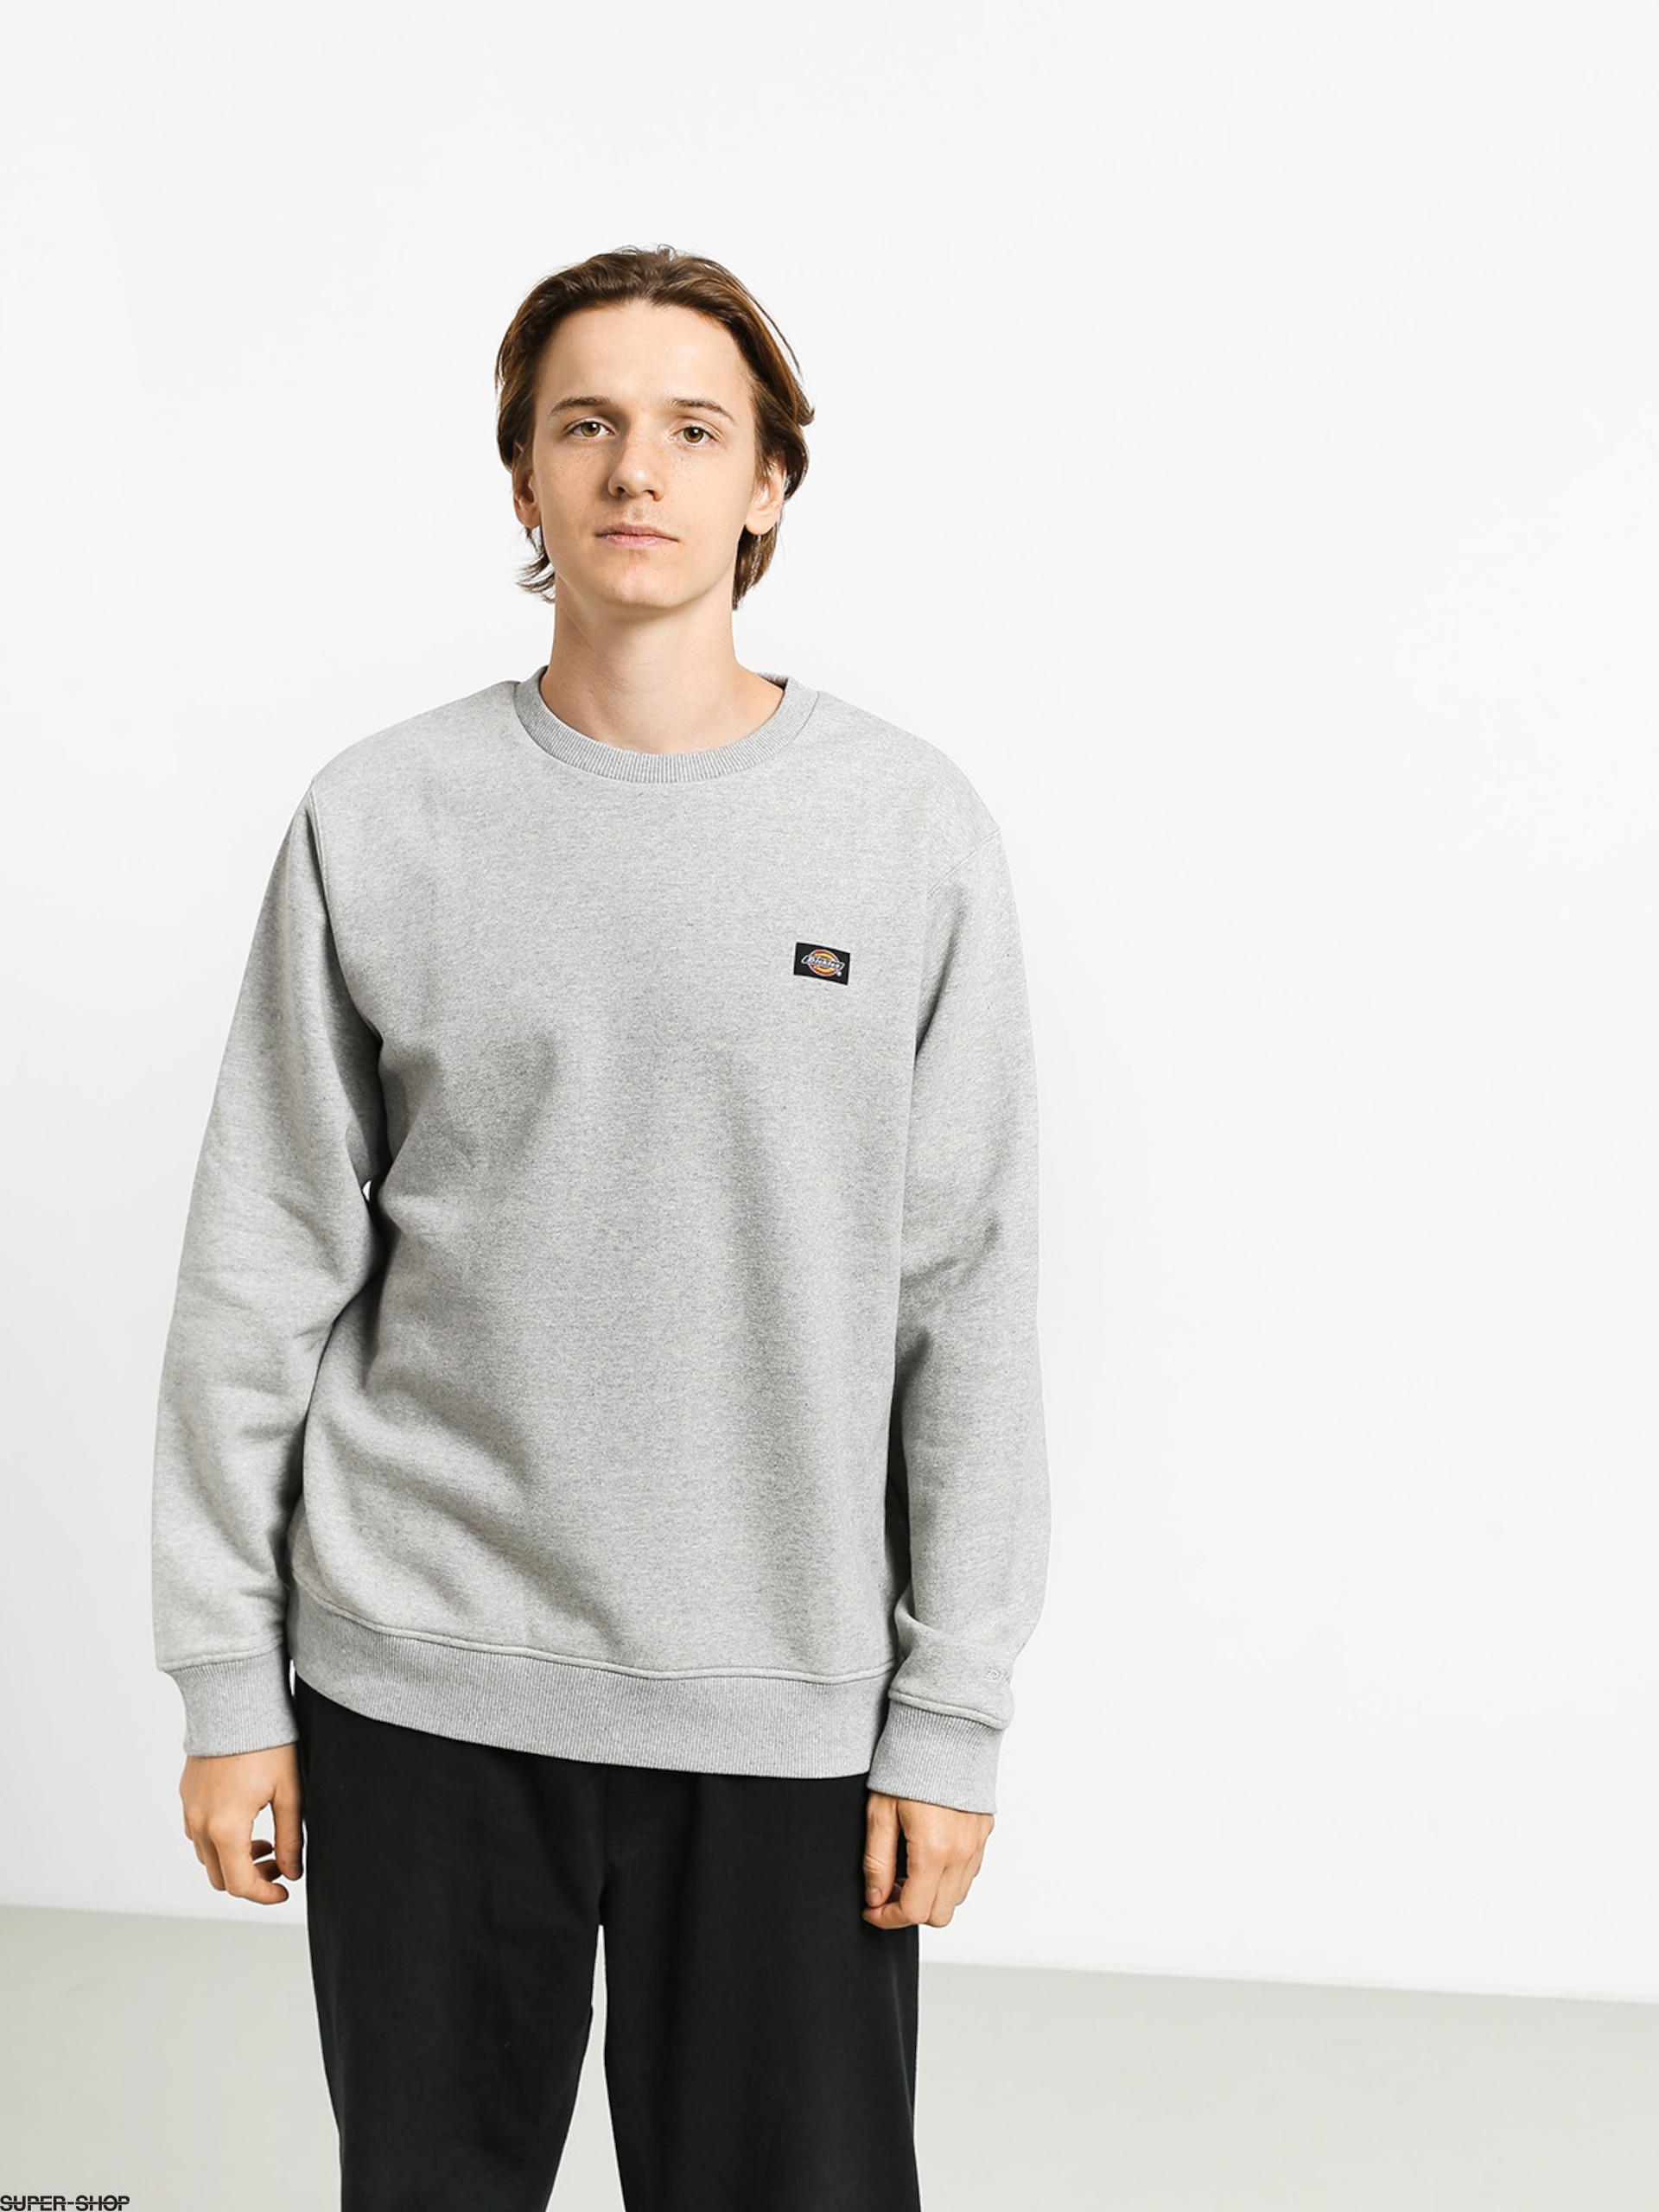 New Jersey Dickies Sweatshirts und Pullover in greymelange